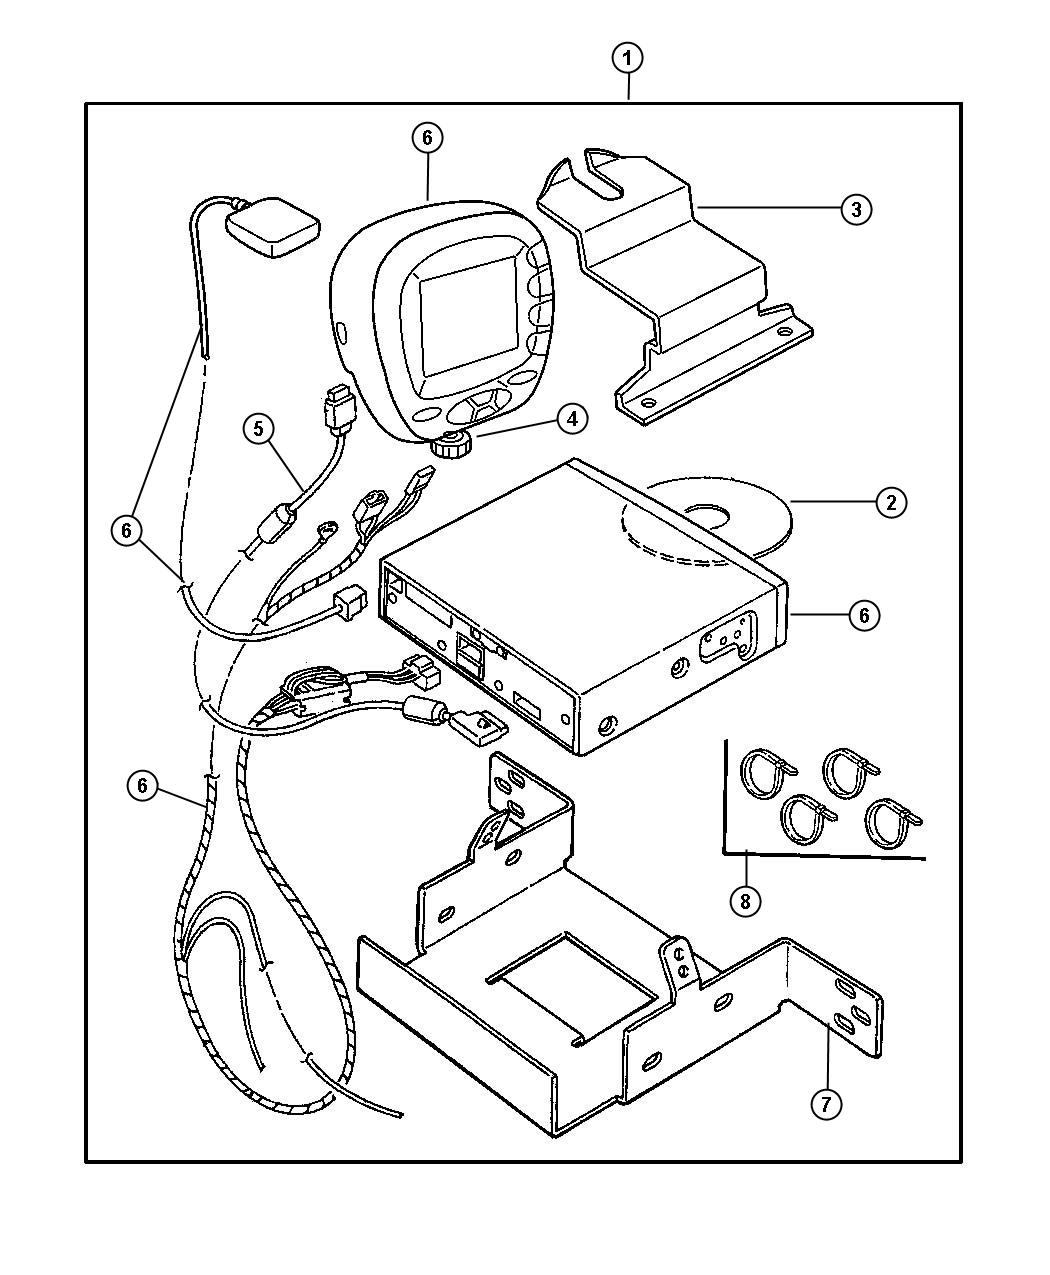 2001 Chrysler PT Cruiser Navigation kit. Generic system